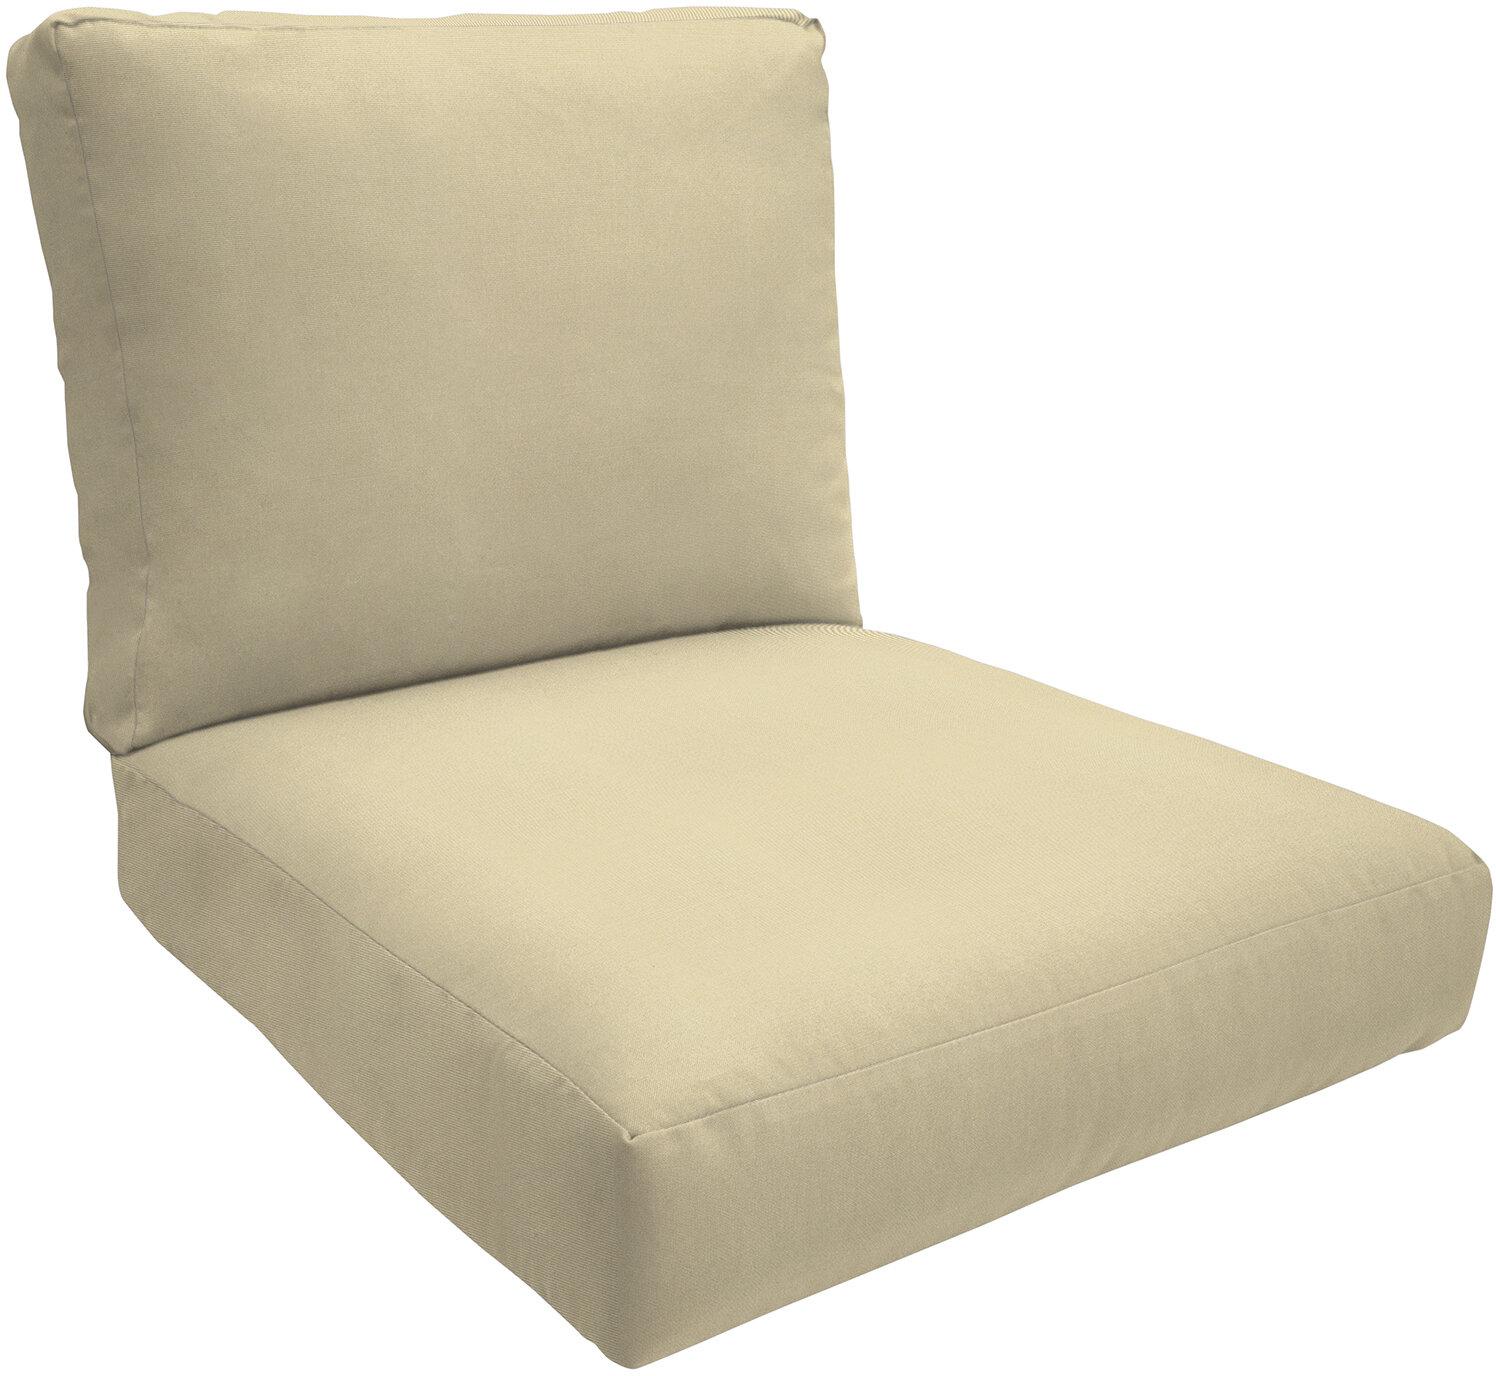 Wayfair Custom Outdoor Cushions Double Piped Outdoor Sunbrella